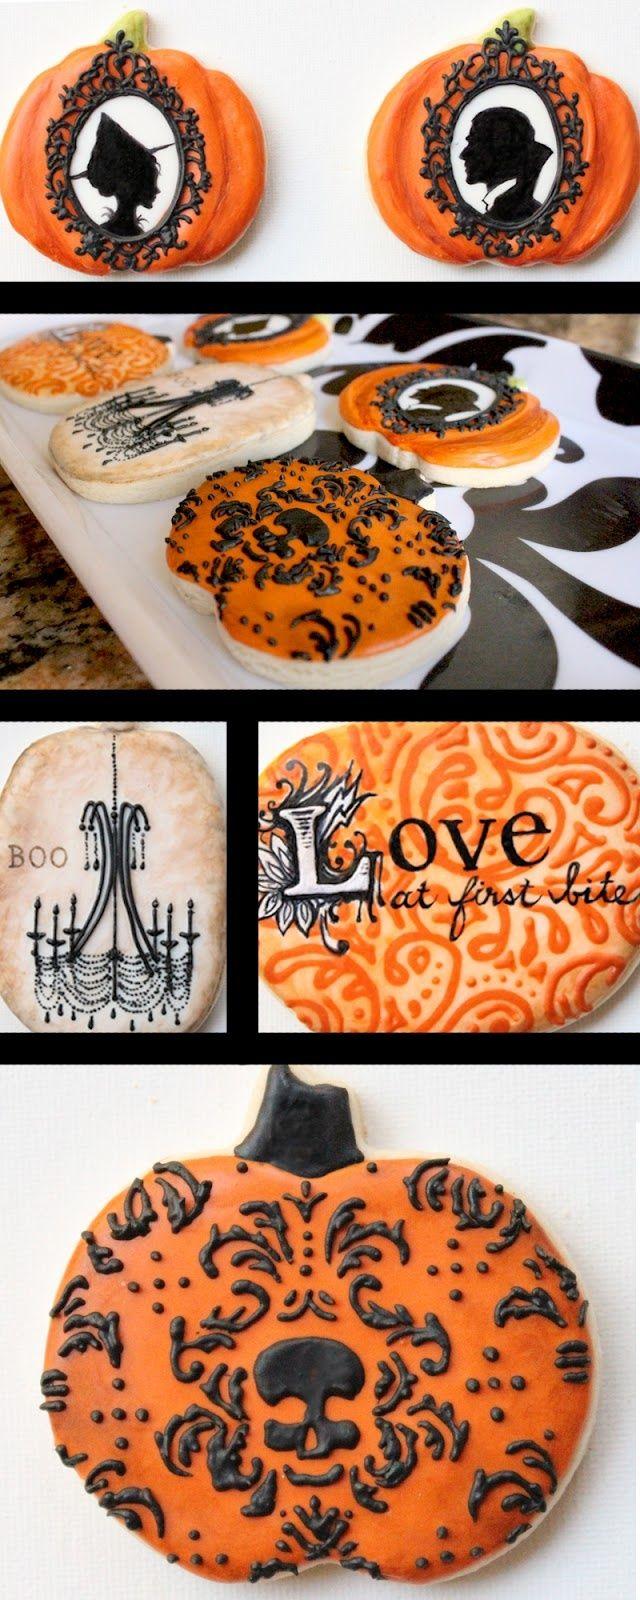 Amazing cookies by this artist!! Arty McGoo: